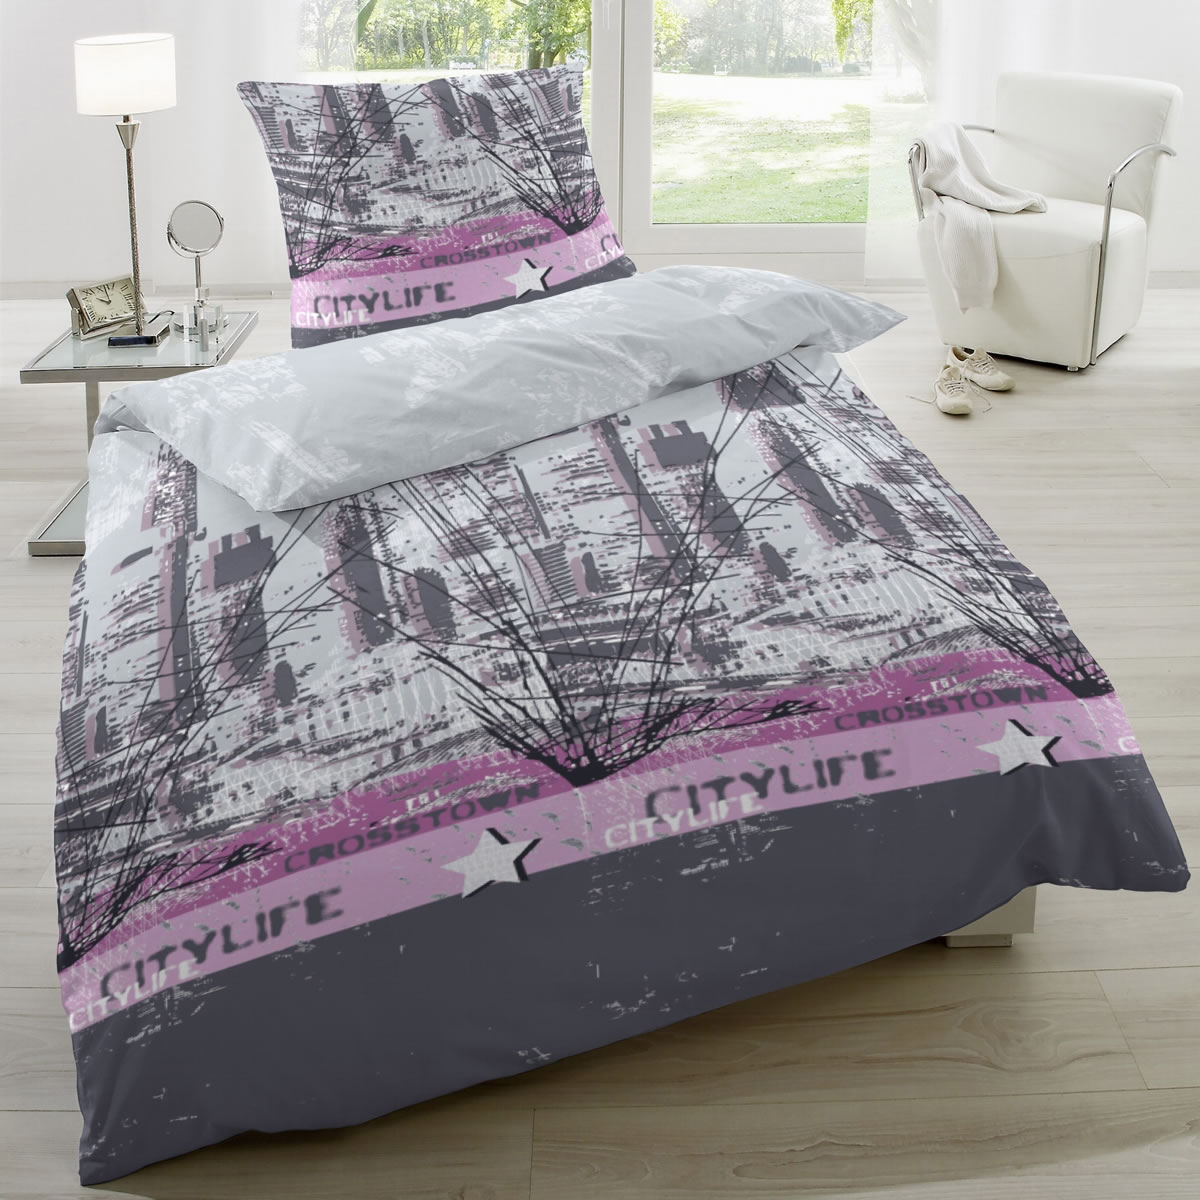 hahn renforce bettw sche 135x200 cm 123028 084. Black Bedroom Furniture Sets. Home Design Ideas